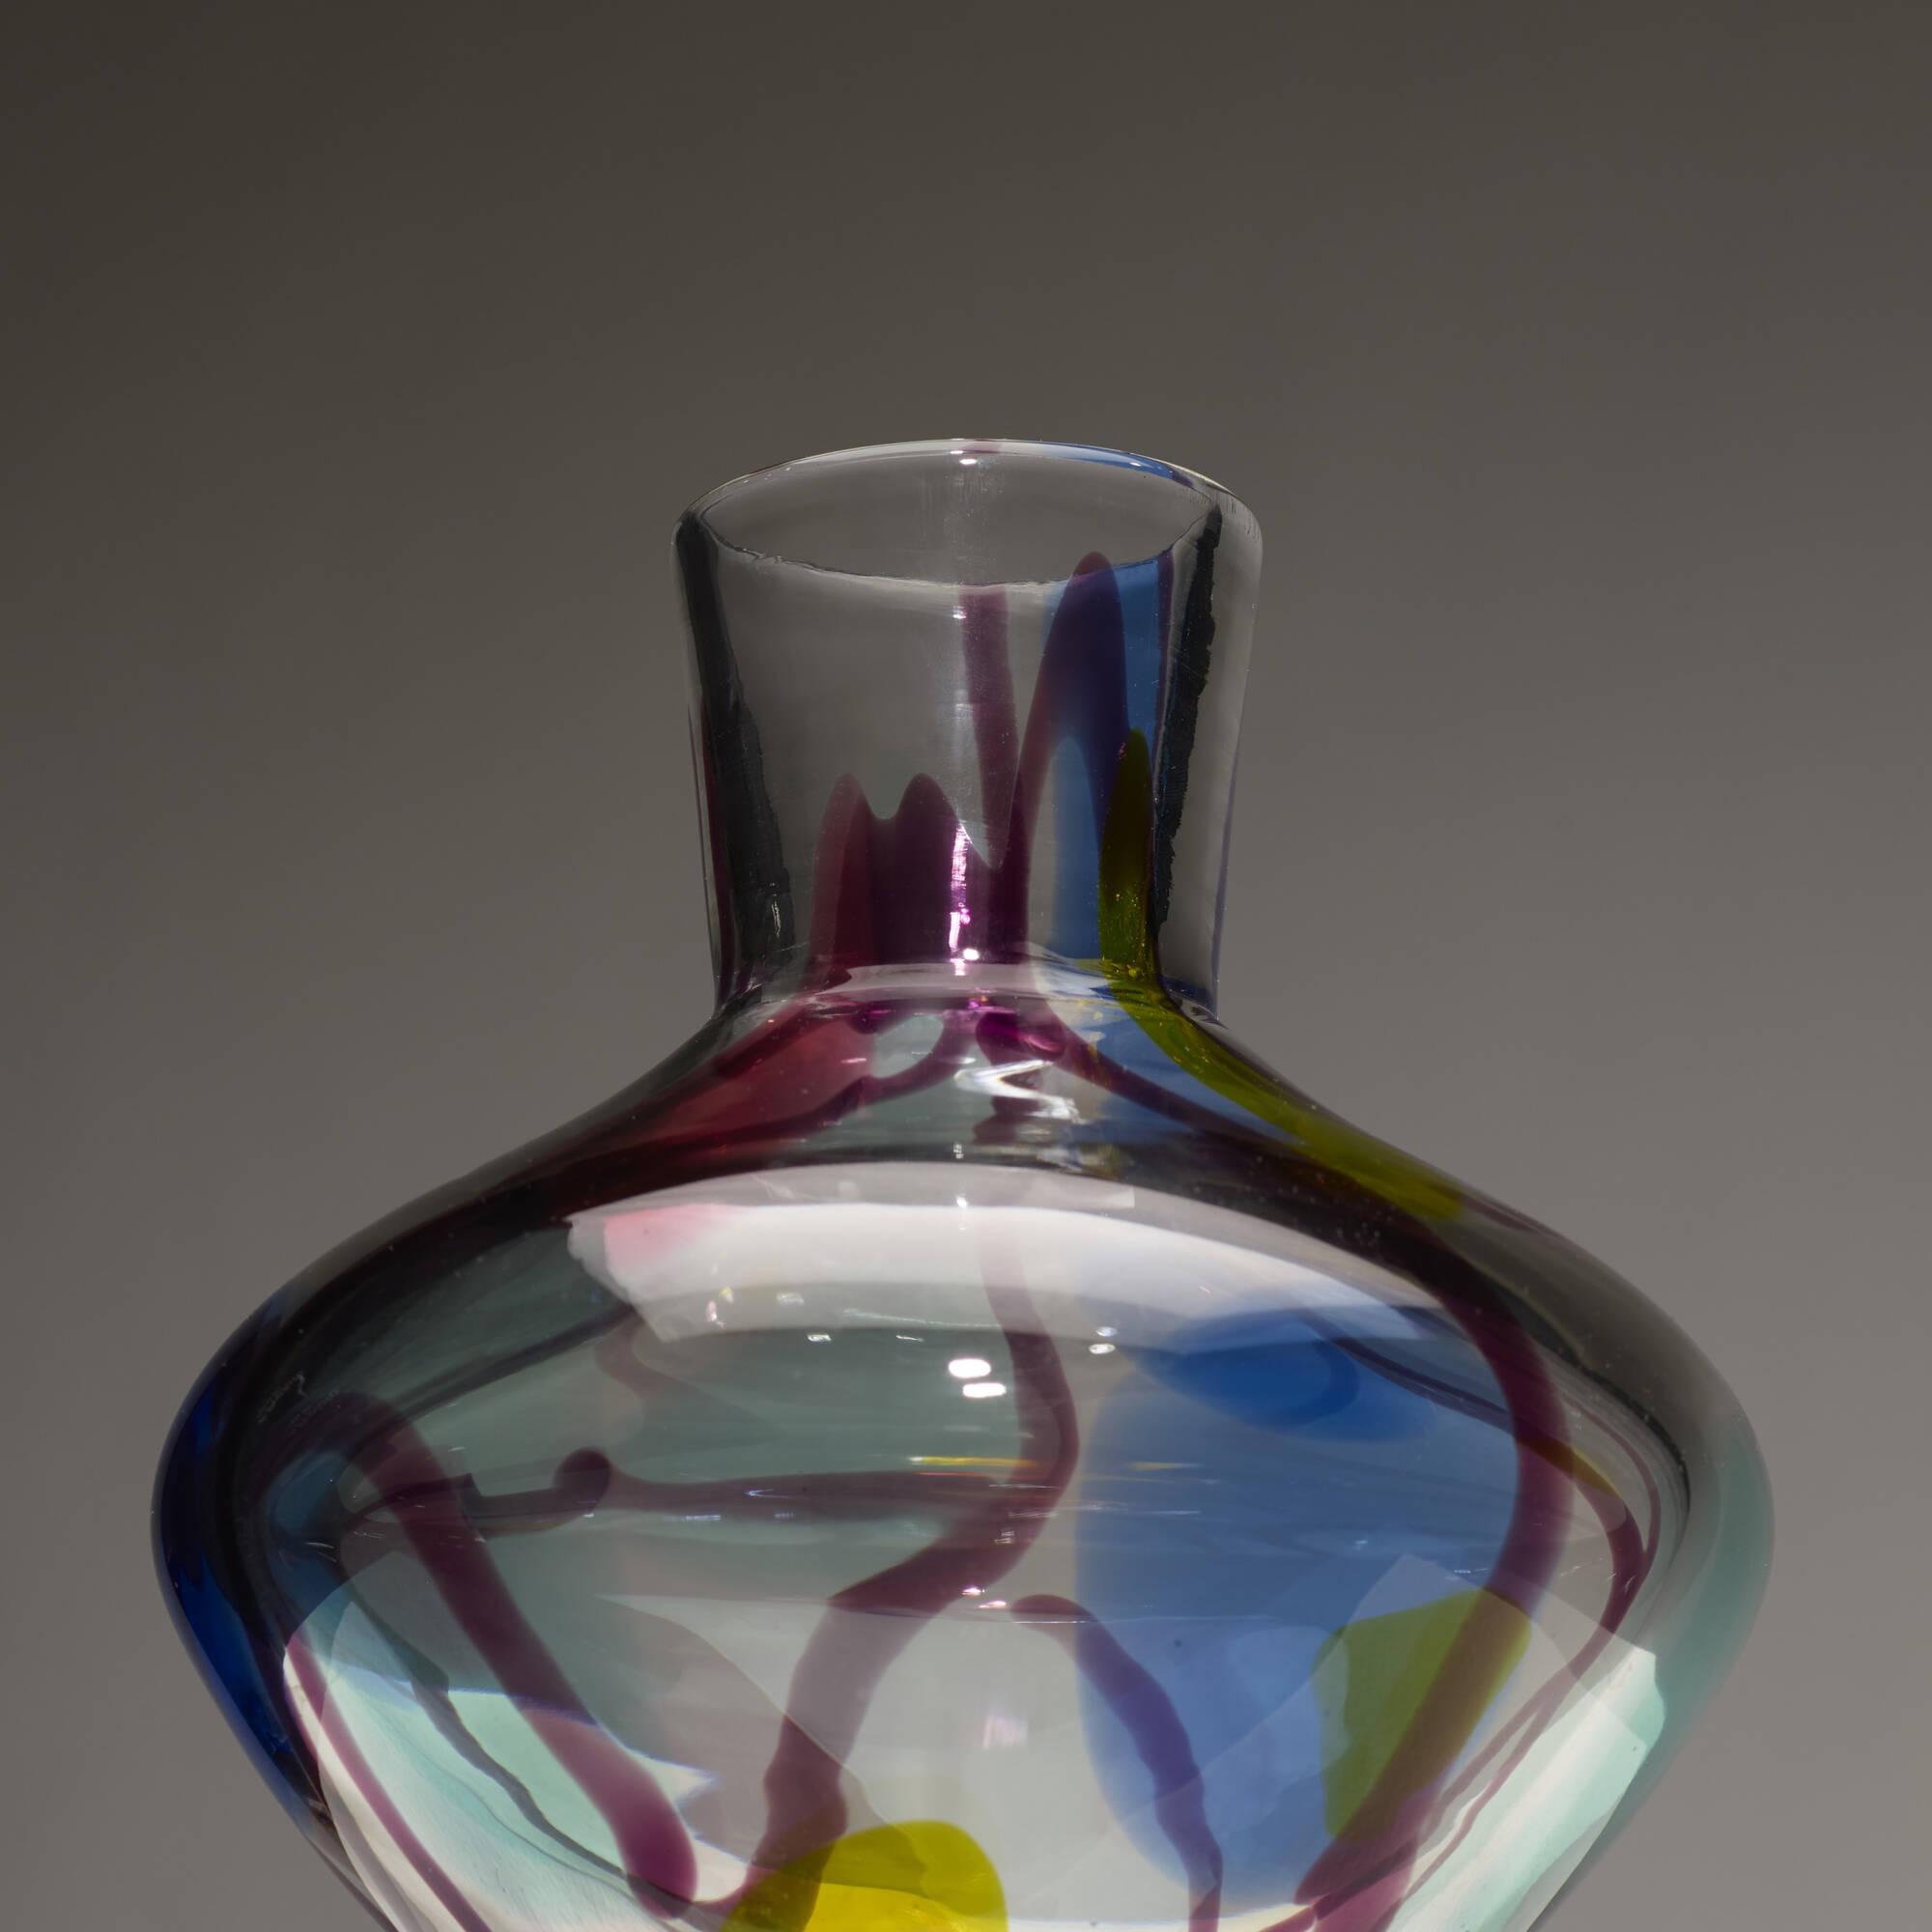 245: Archimede Seguso / vase (3 of 3)